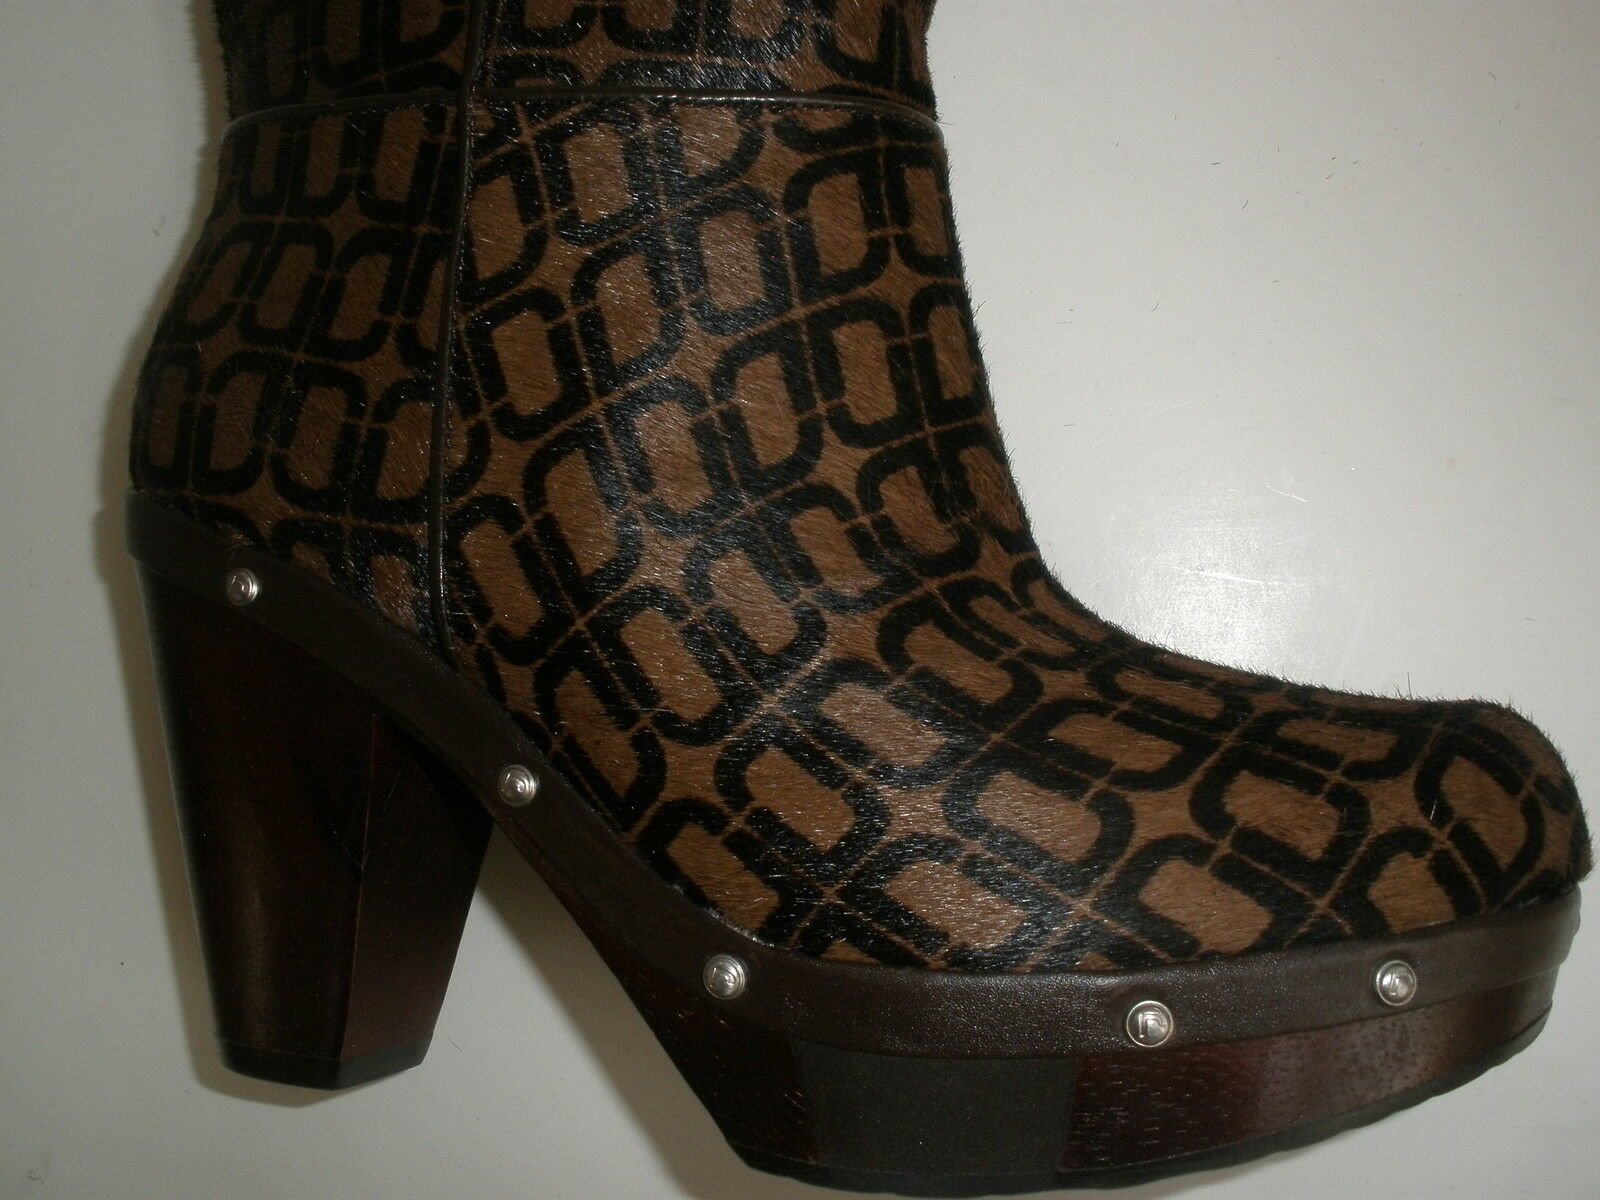 Rockport-adprene de Adidas botas cowskin US 6 EUR 36 Rareza Nueva Rareza 36  99 86153e